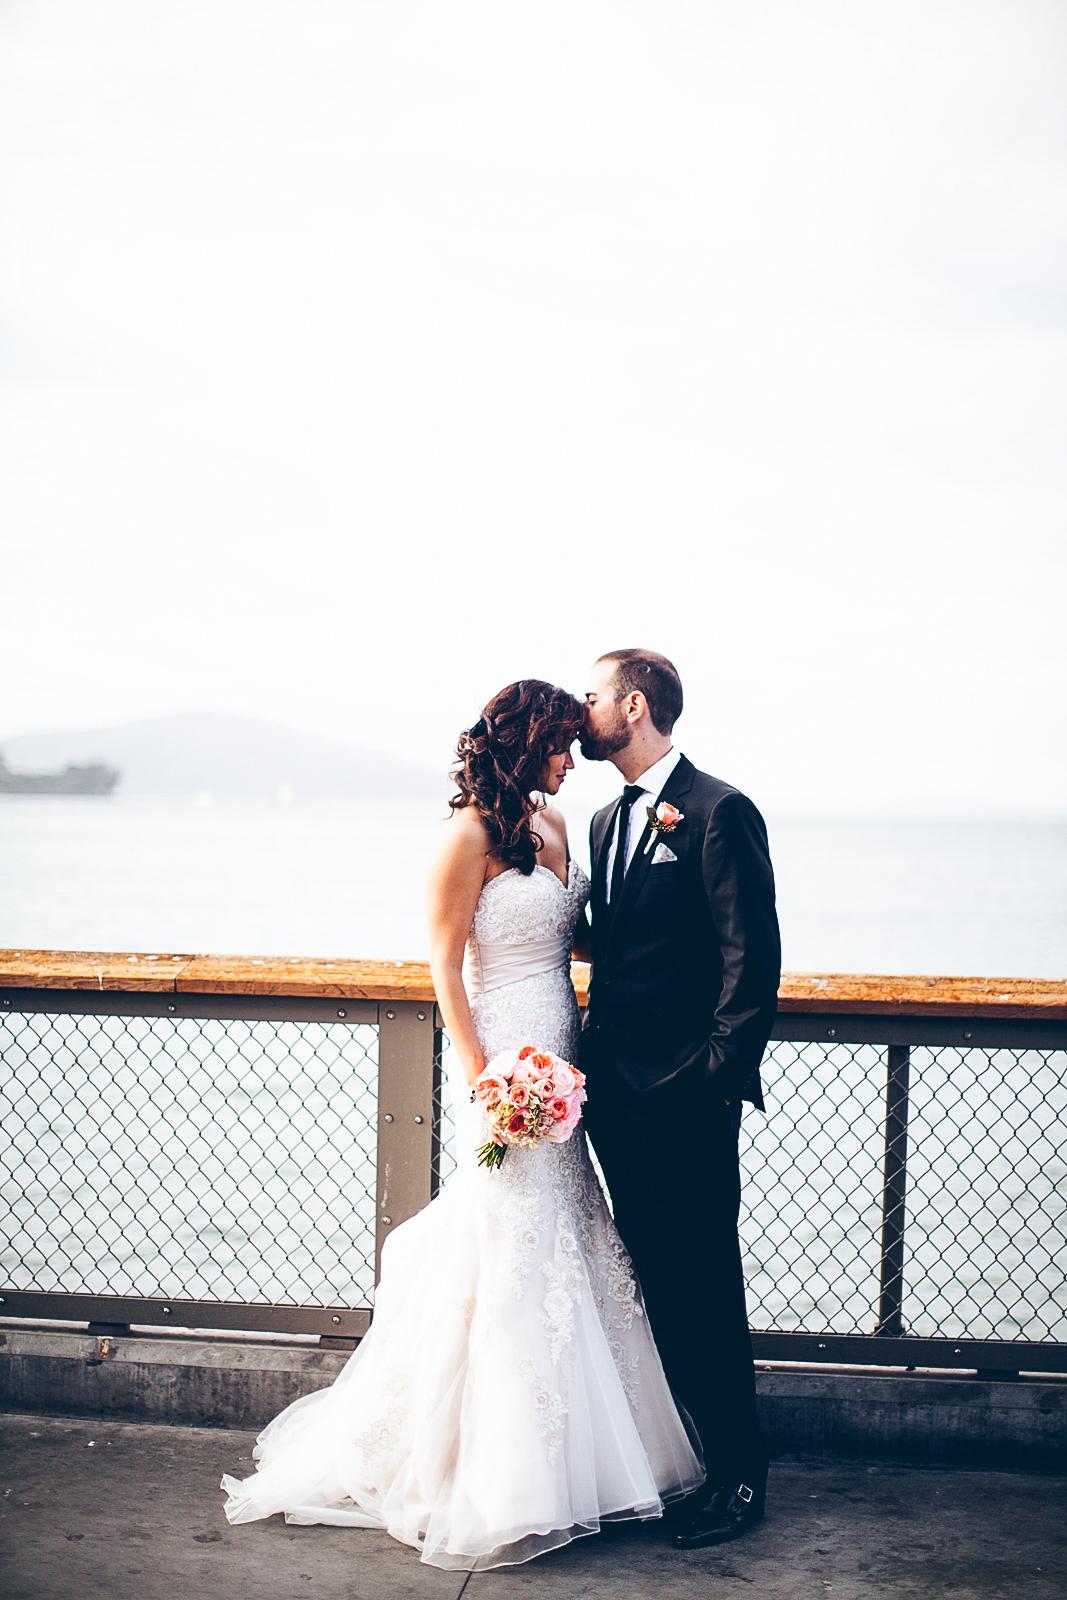 San_francisco_city_hall_wedding_photography_meegan_travis_ebony_siovhan_bokeh_photography_83.jpg